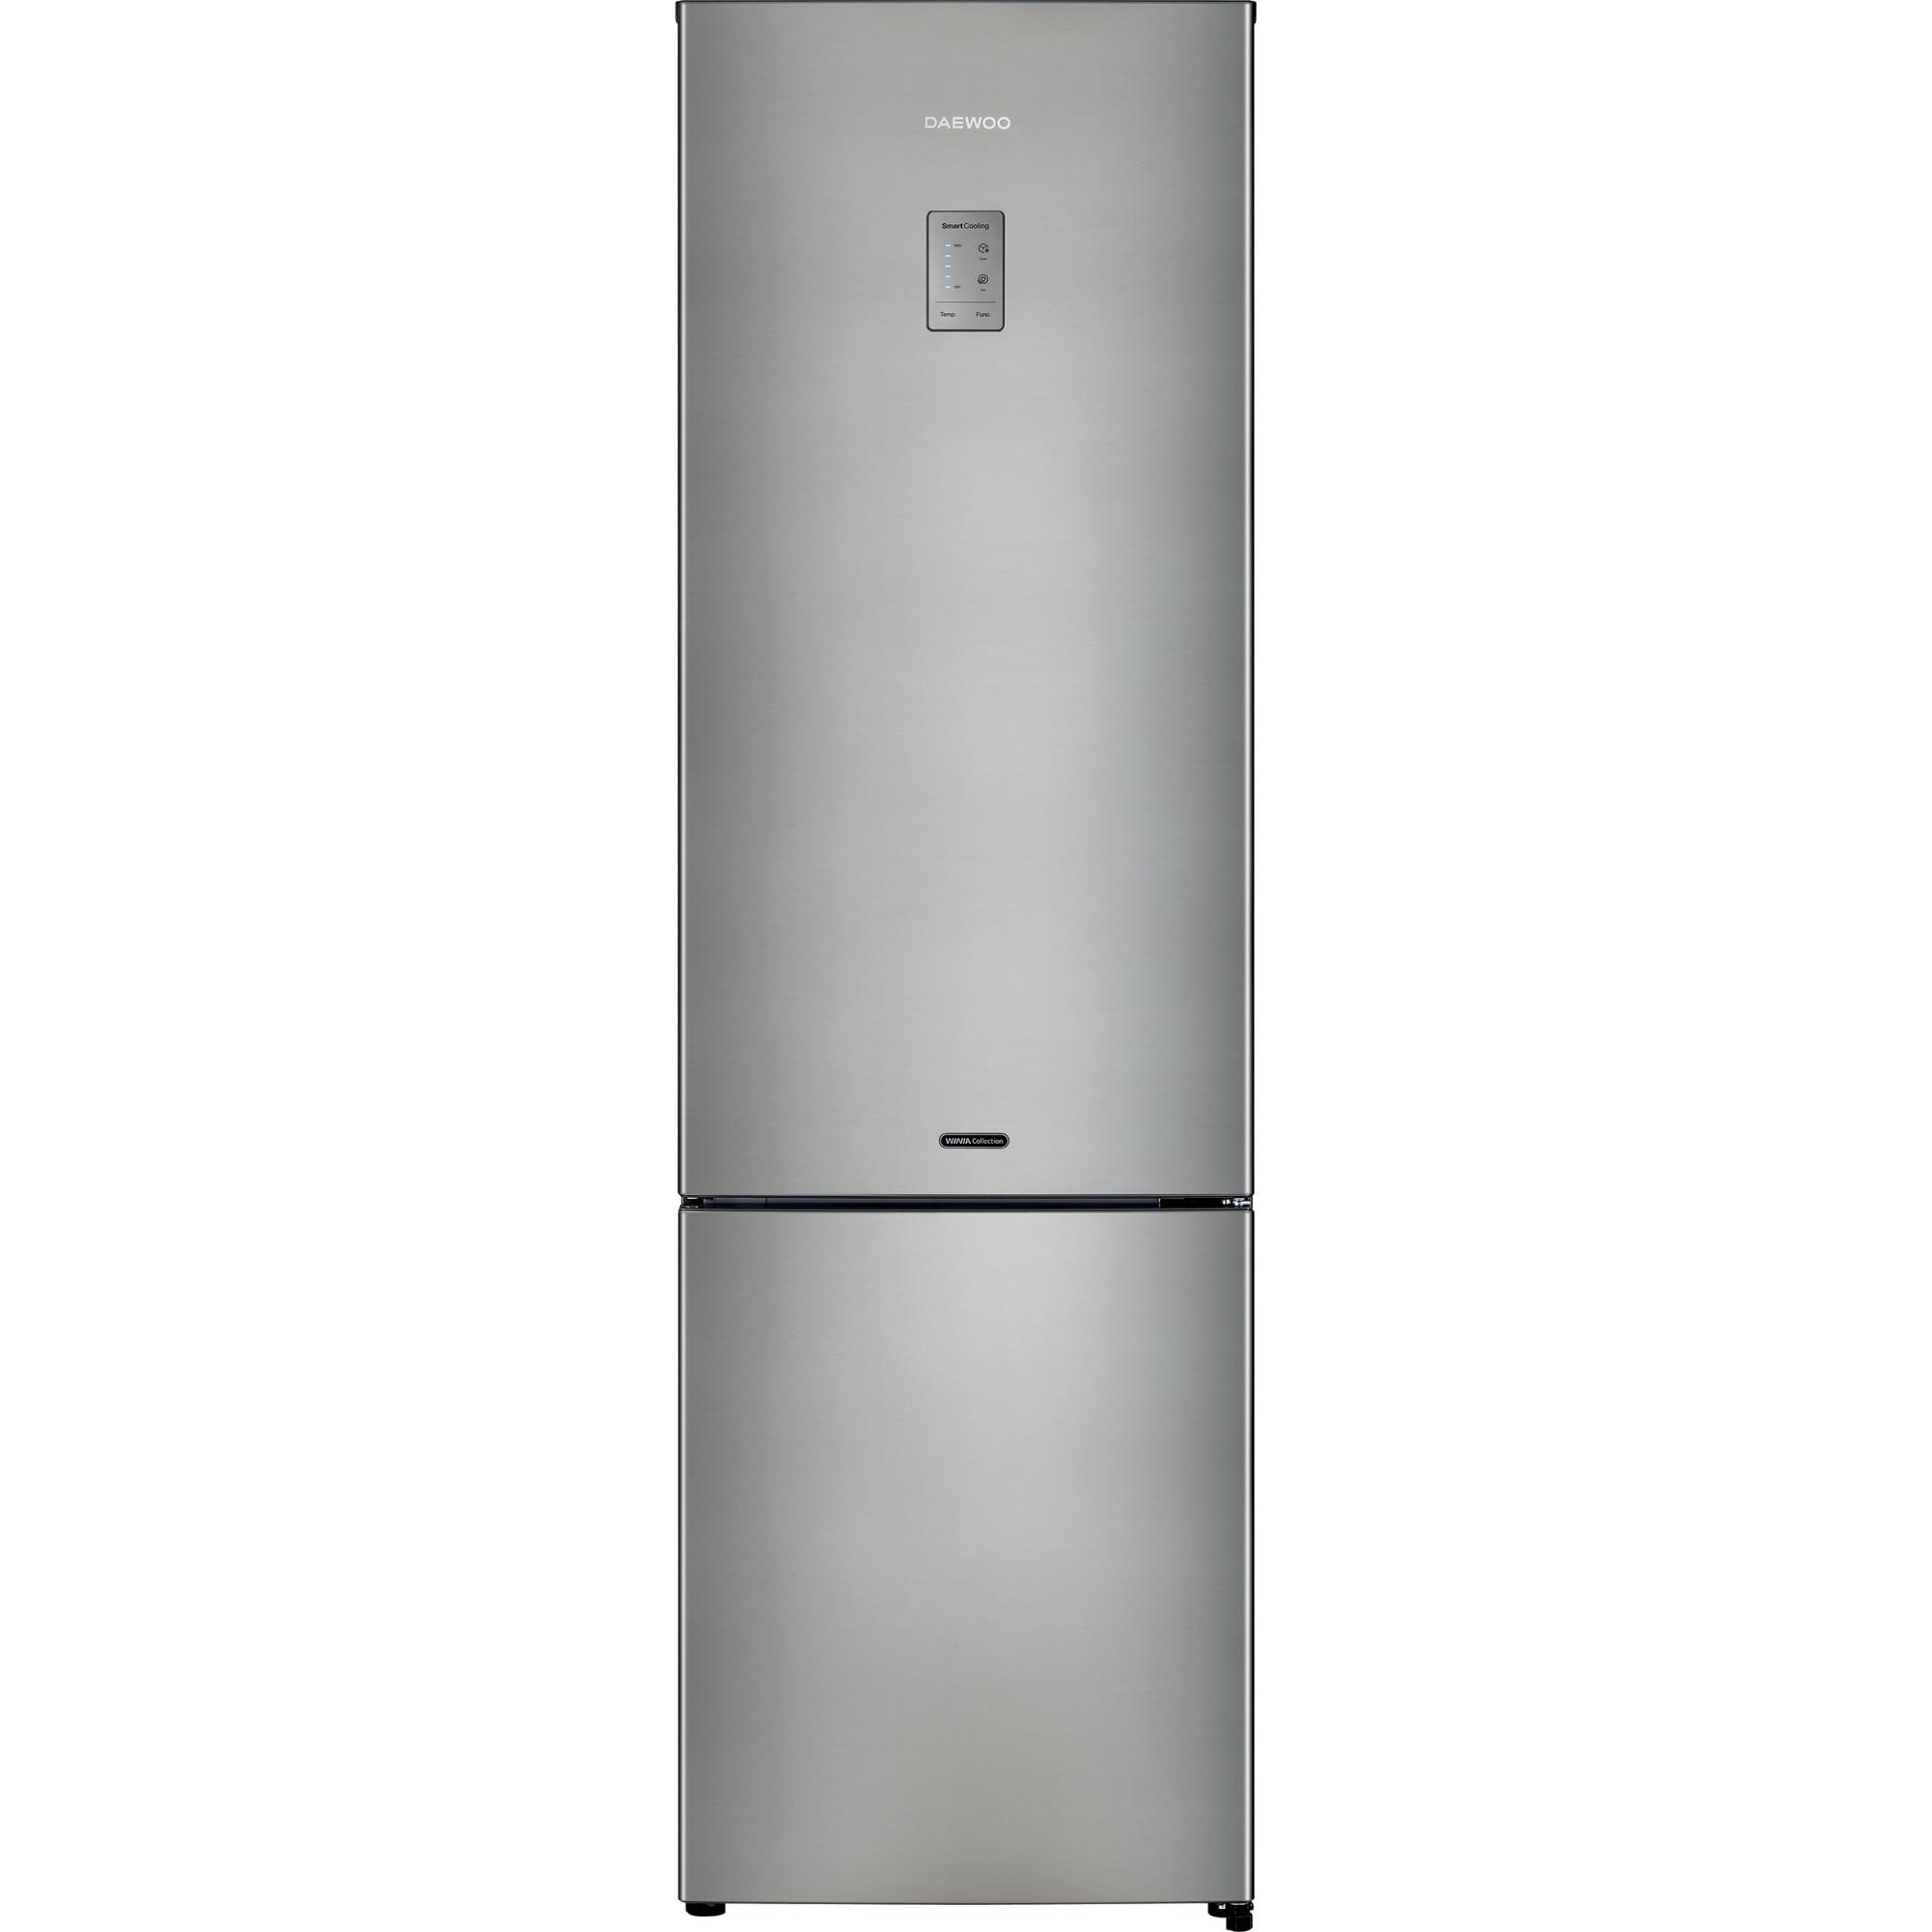 Fotografie Combina frigorifica Daewoo RN-N536RNS, 362 l, Clasa A++, Full No Frost, Iluminare LED, H 200 cm, Inox